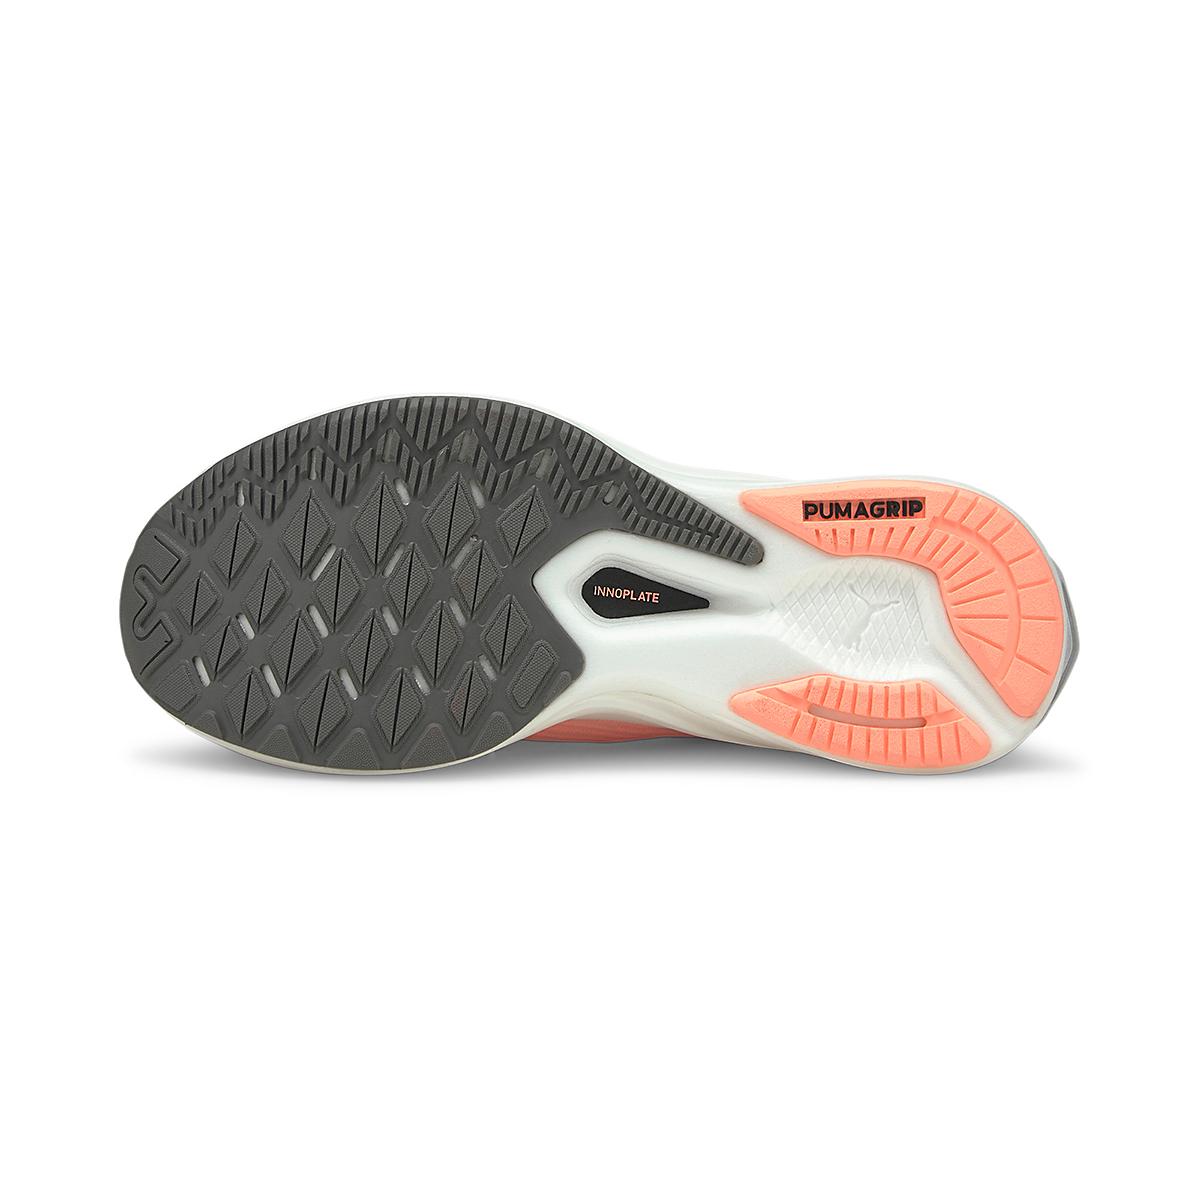 Women's Puma Deviate Nitro Running Shoe - Color: Elektro Peach - Size: 5.5 - Width: Regular, Elektro Peach, large, image 3